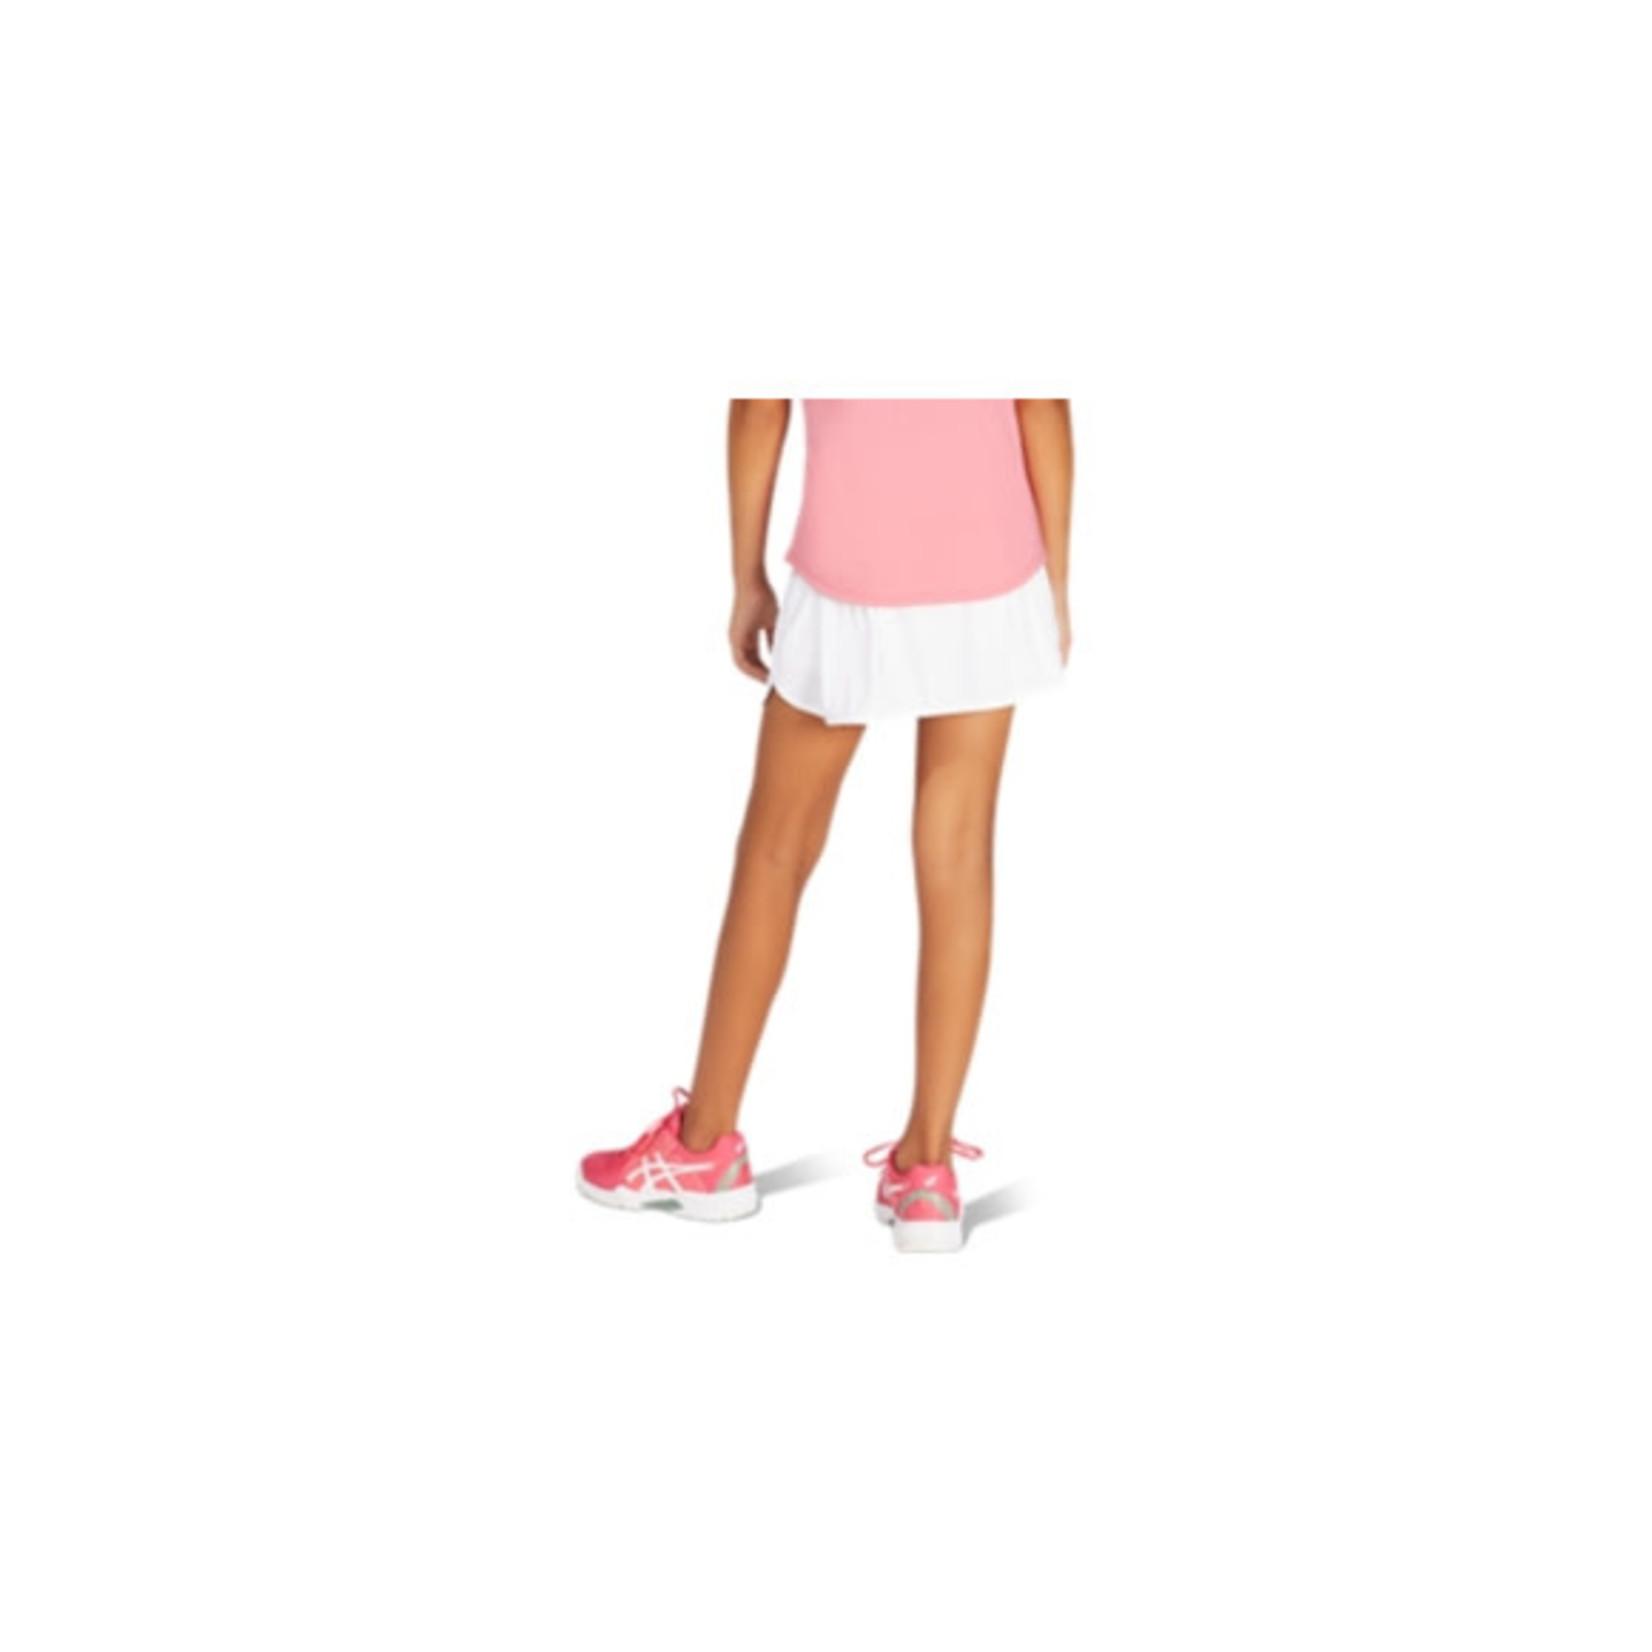 Asics Meisjes - Tennis Skirt Wit